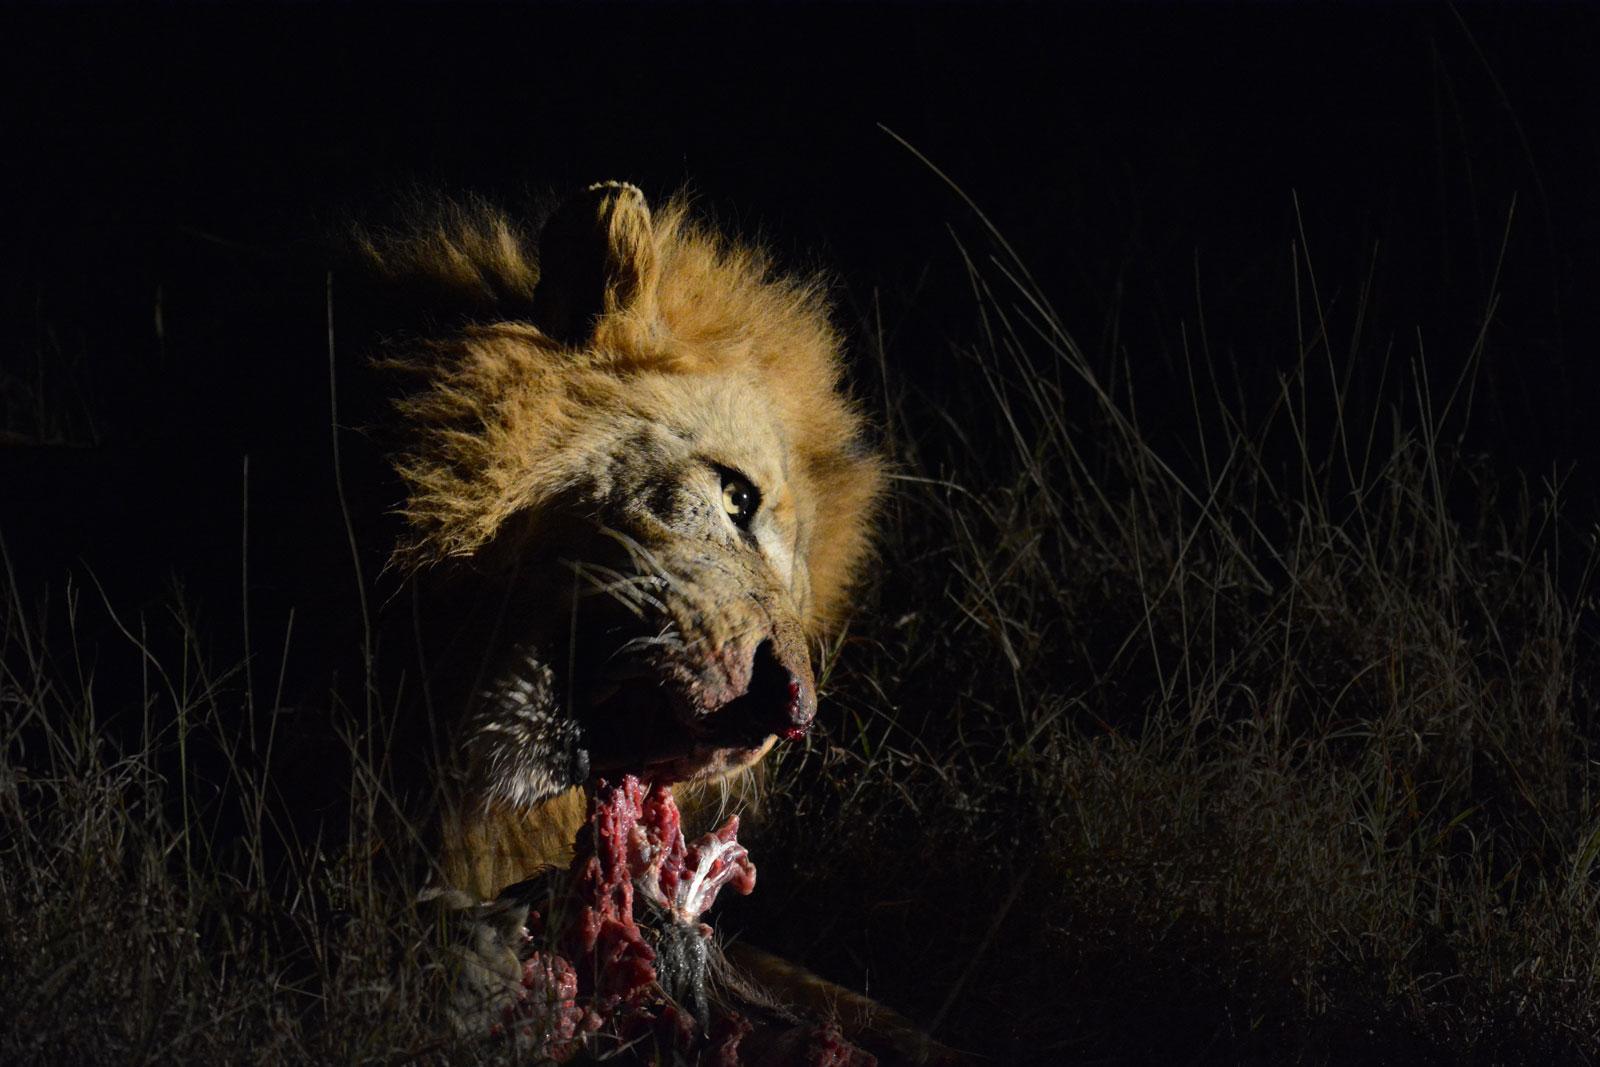 Lion on Kill - Kevin MacLaughlin